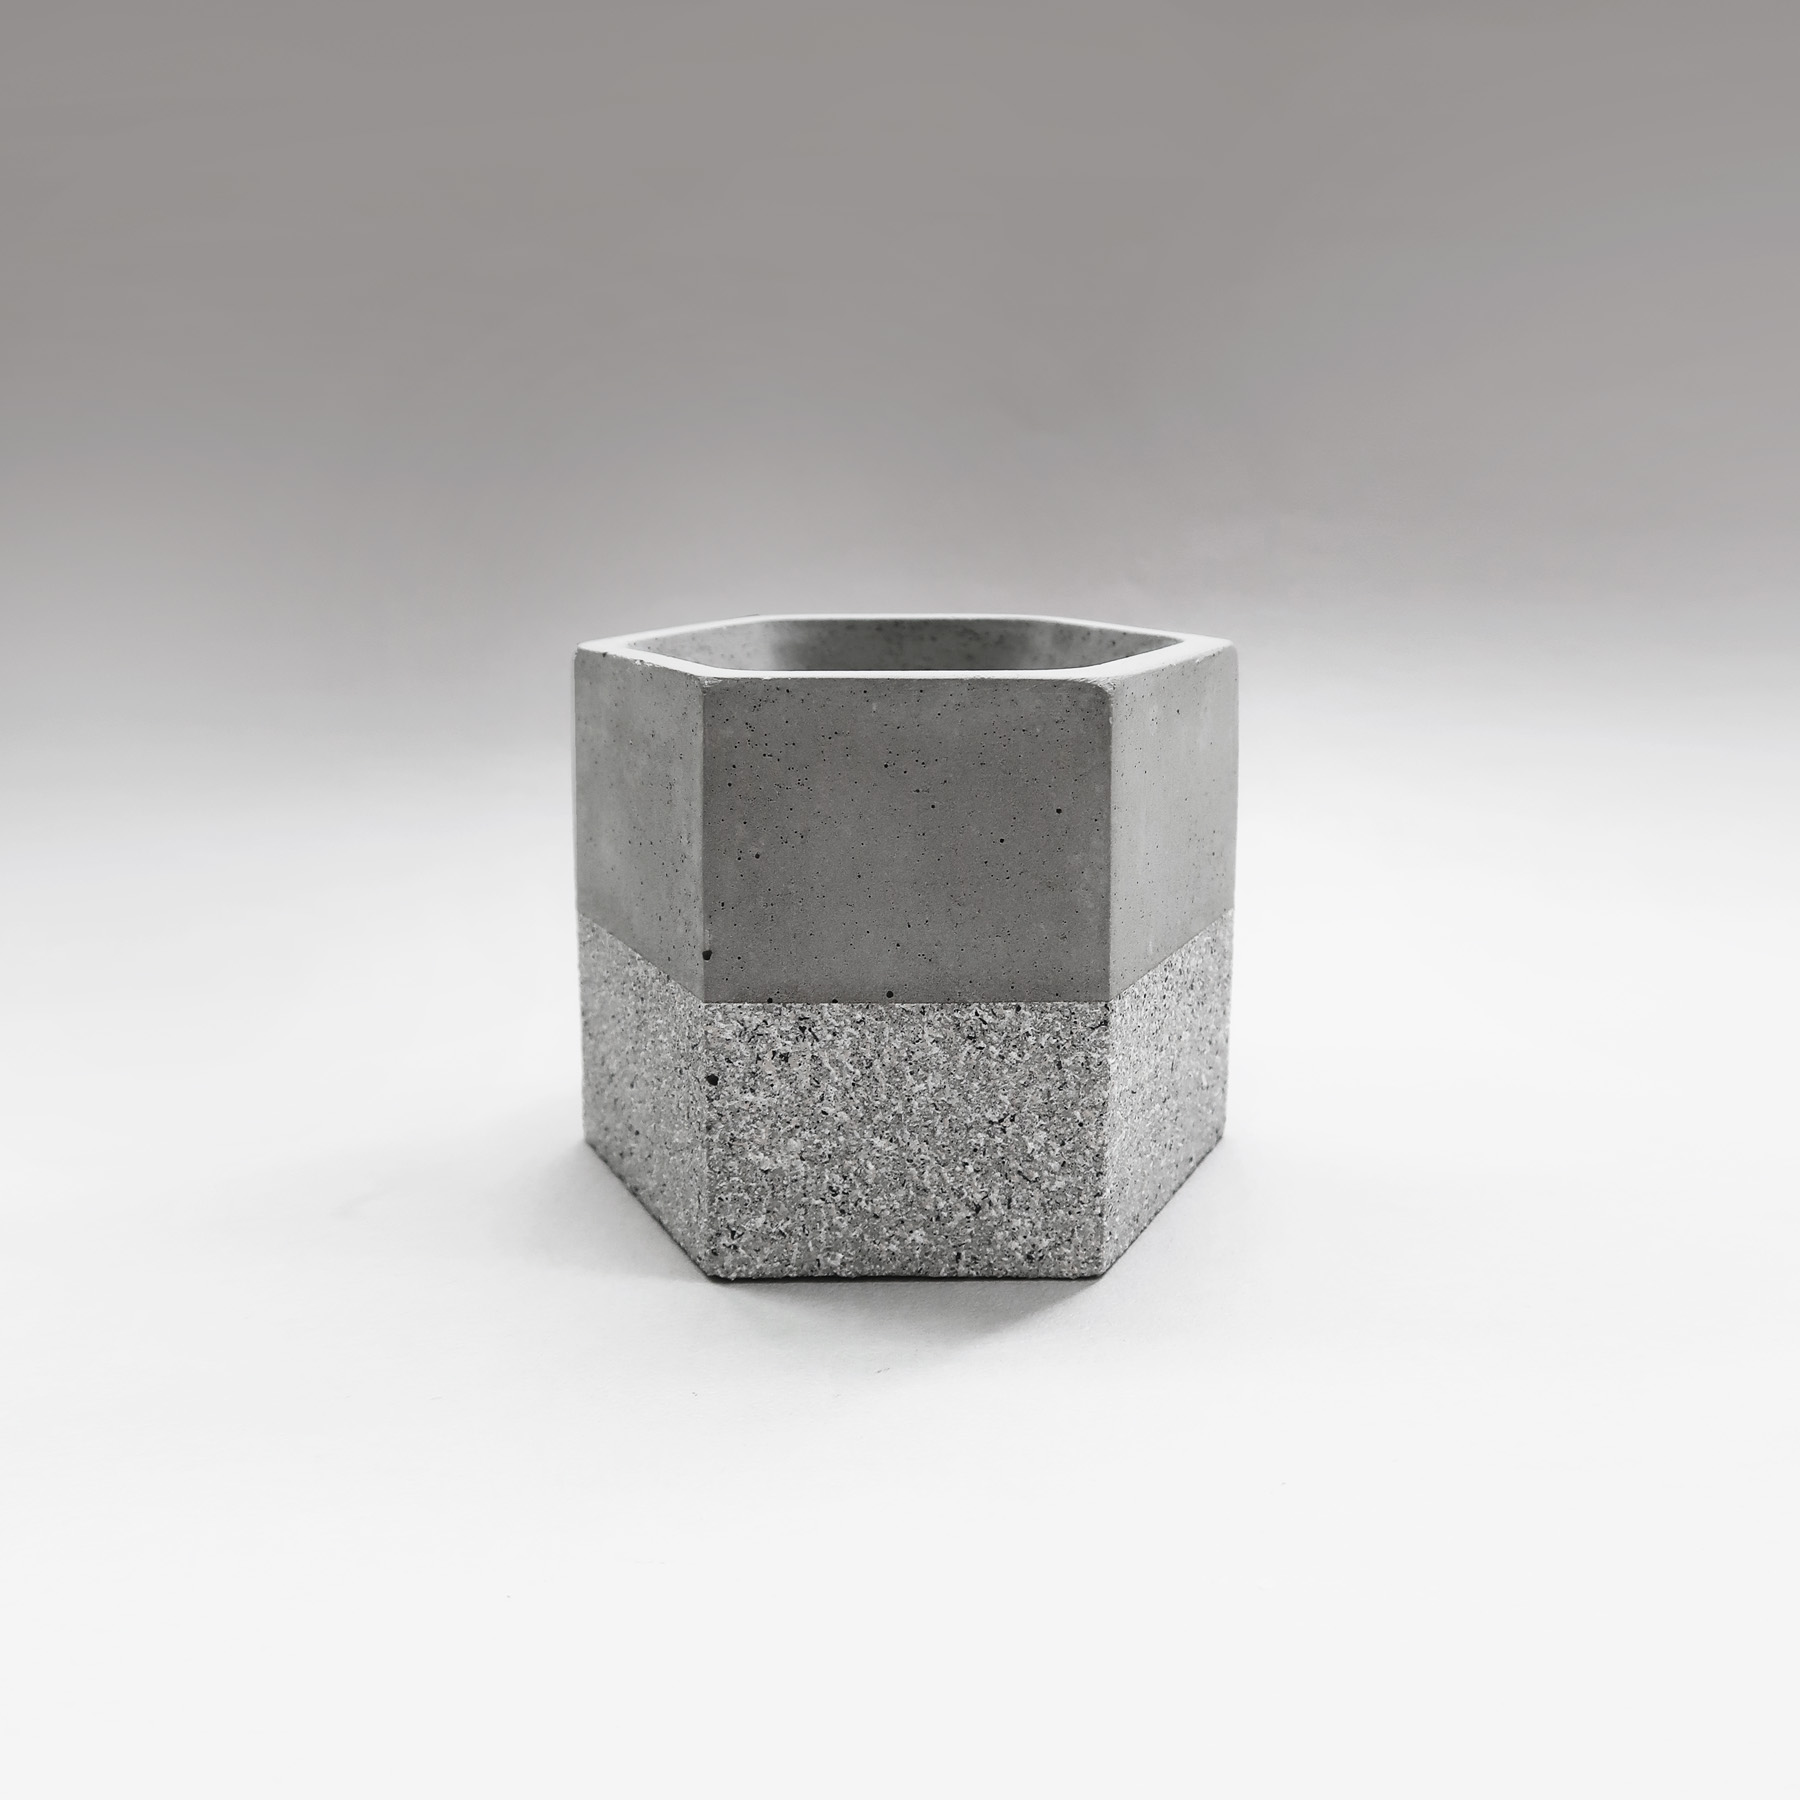 GRANITE 花崗岩六角水泥設計盆器・盆栽